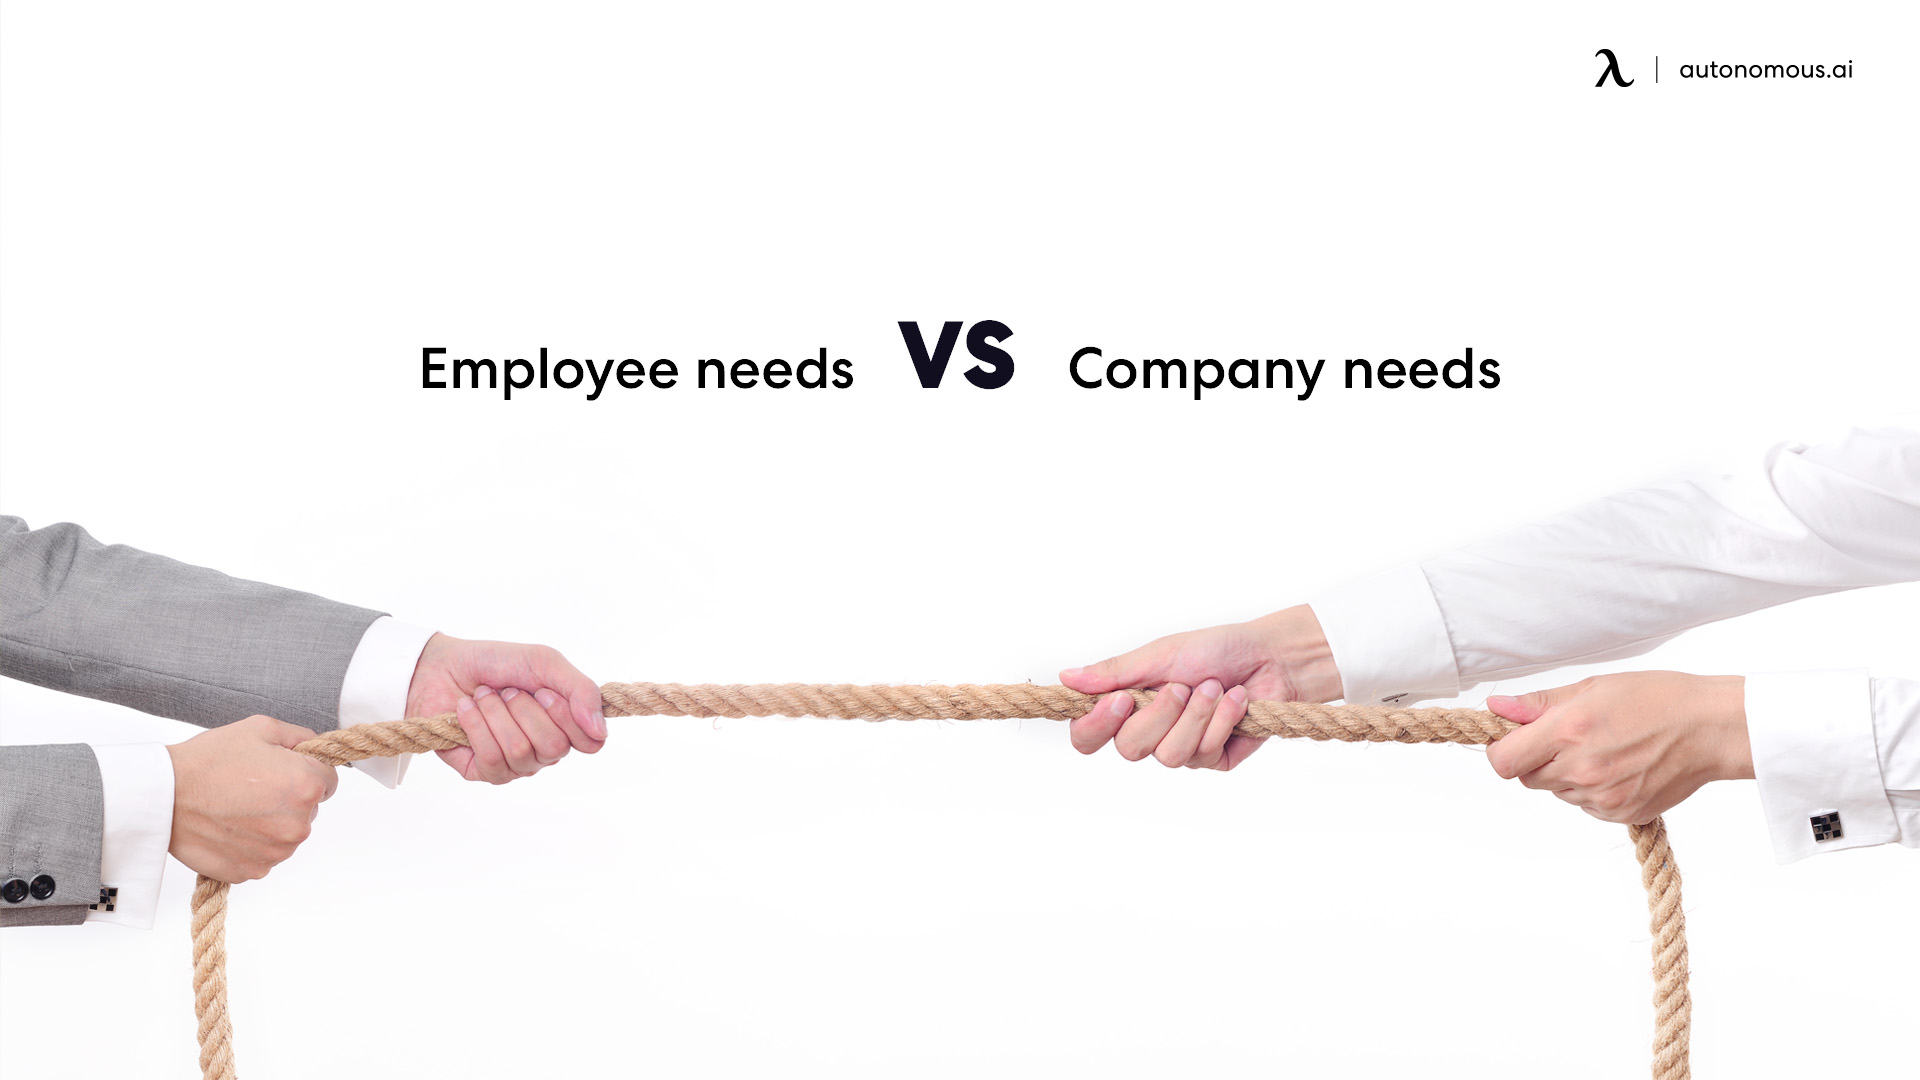 Employee needs vs company needs